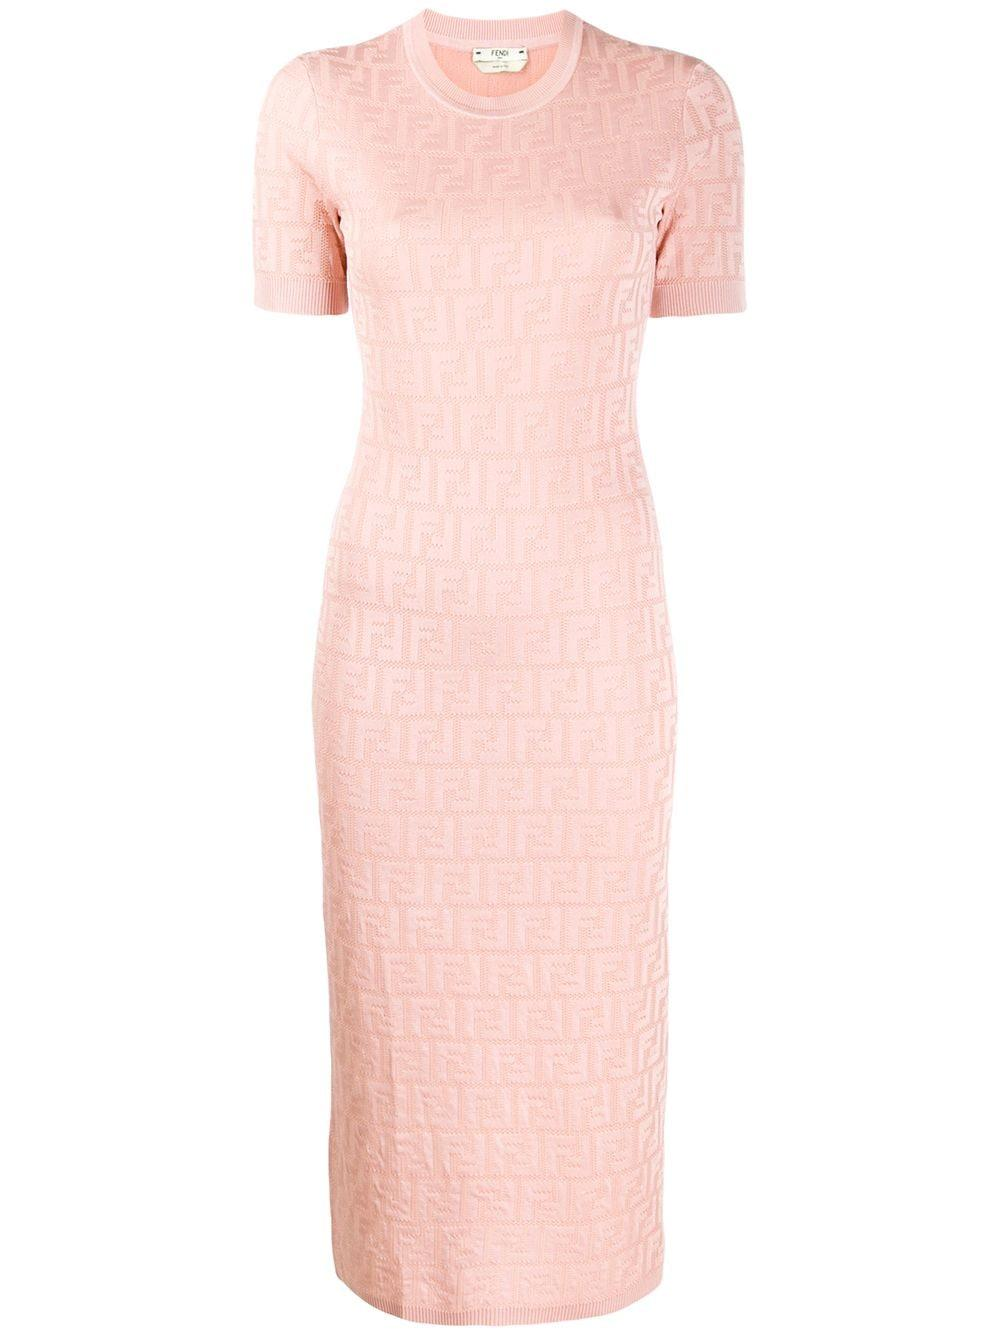 Ff Short Sleeve Viscose Cotton Midi Dress Item # FZD832-AAVG